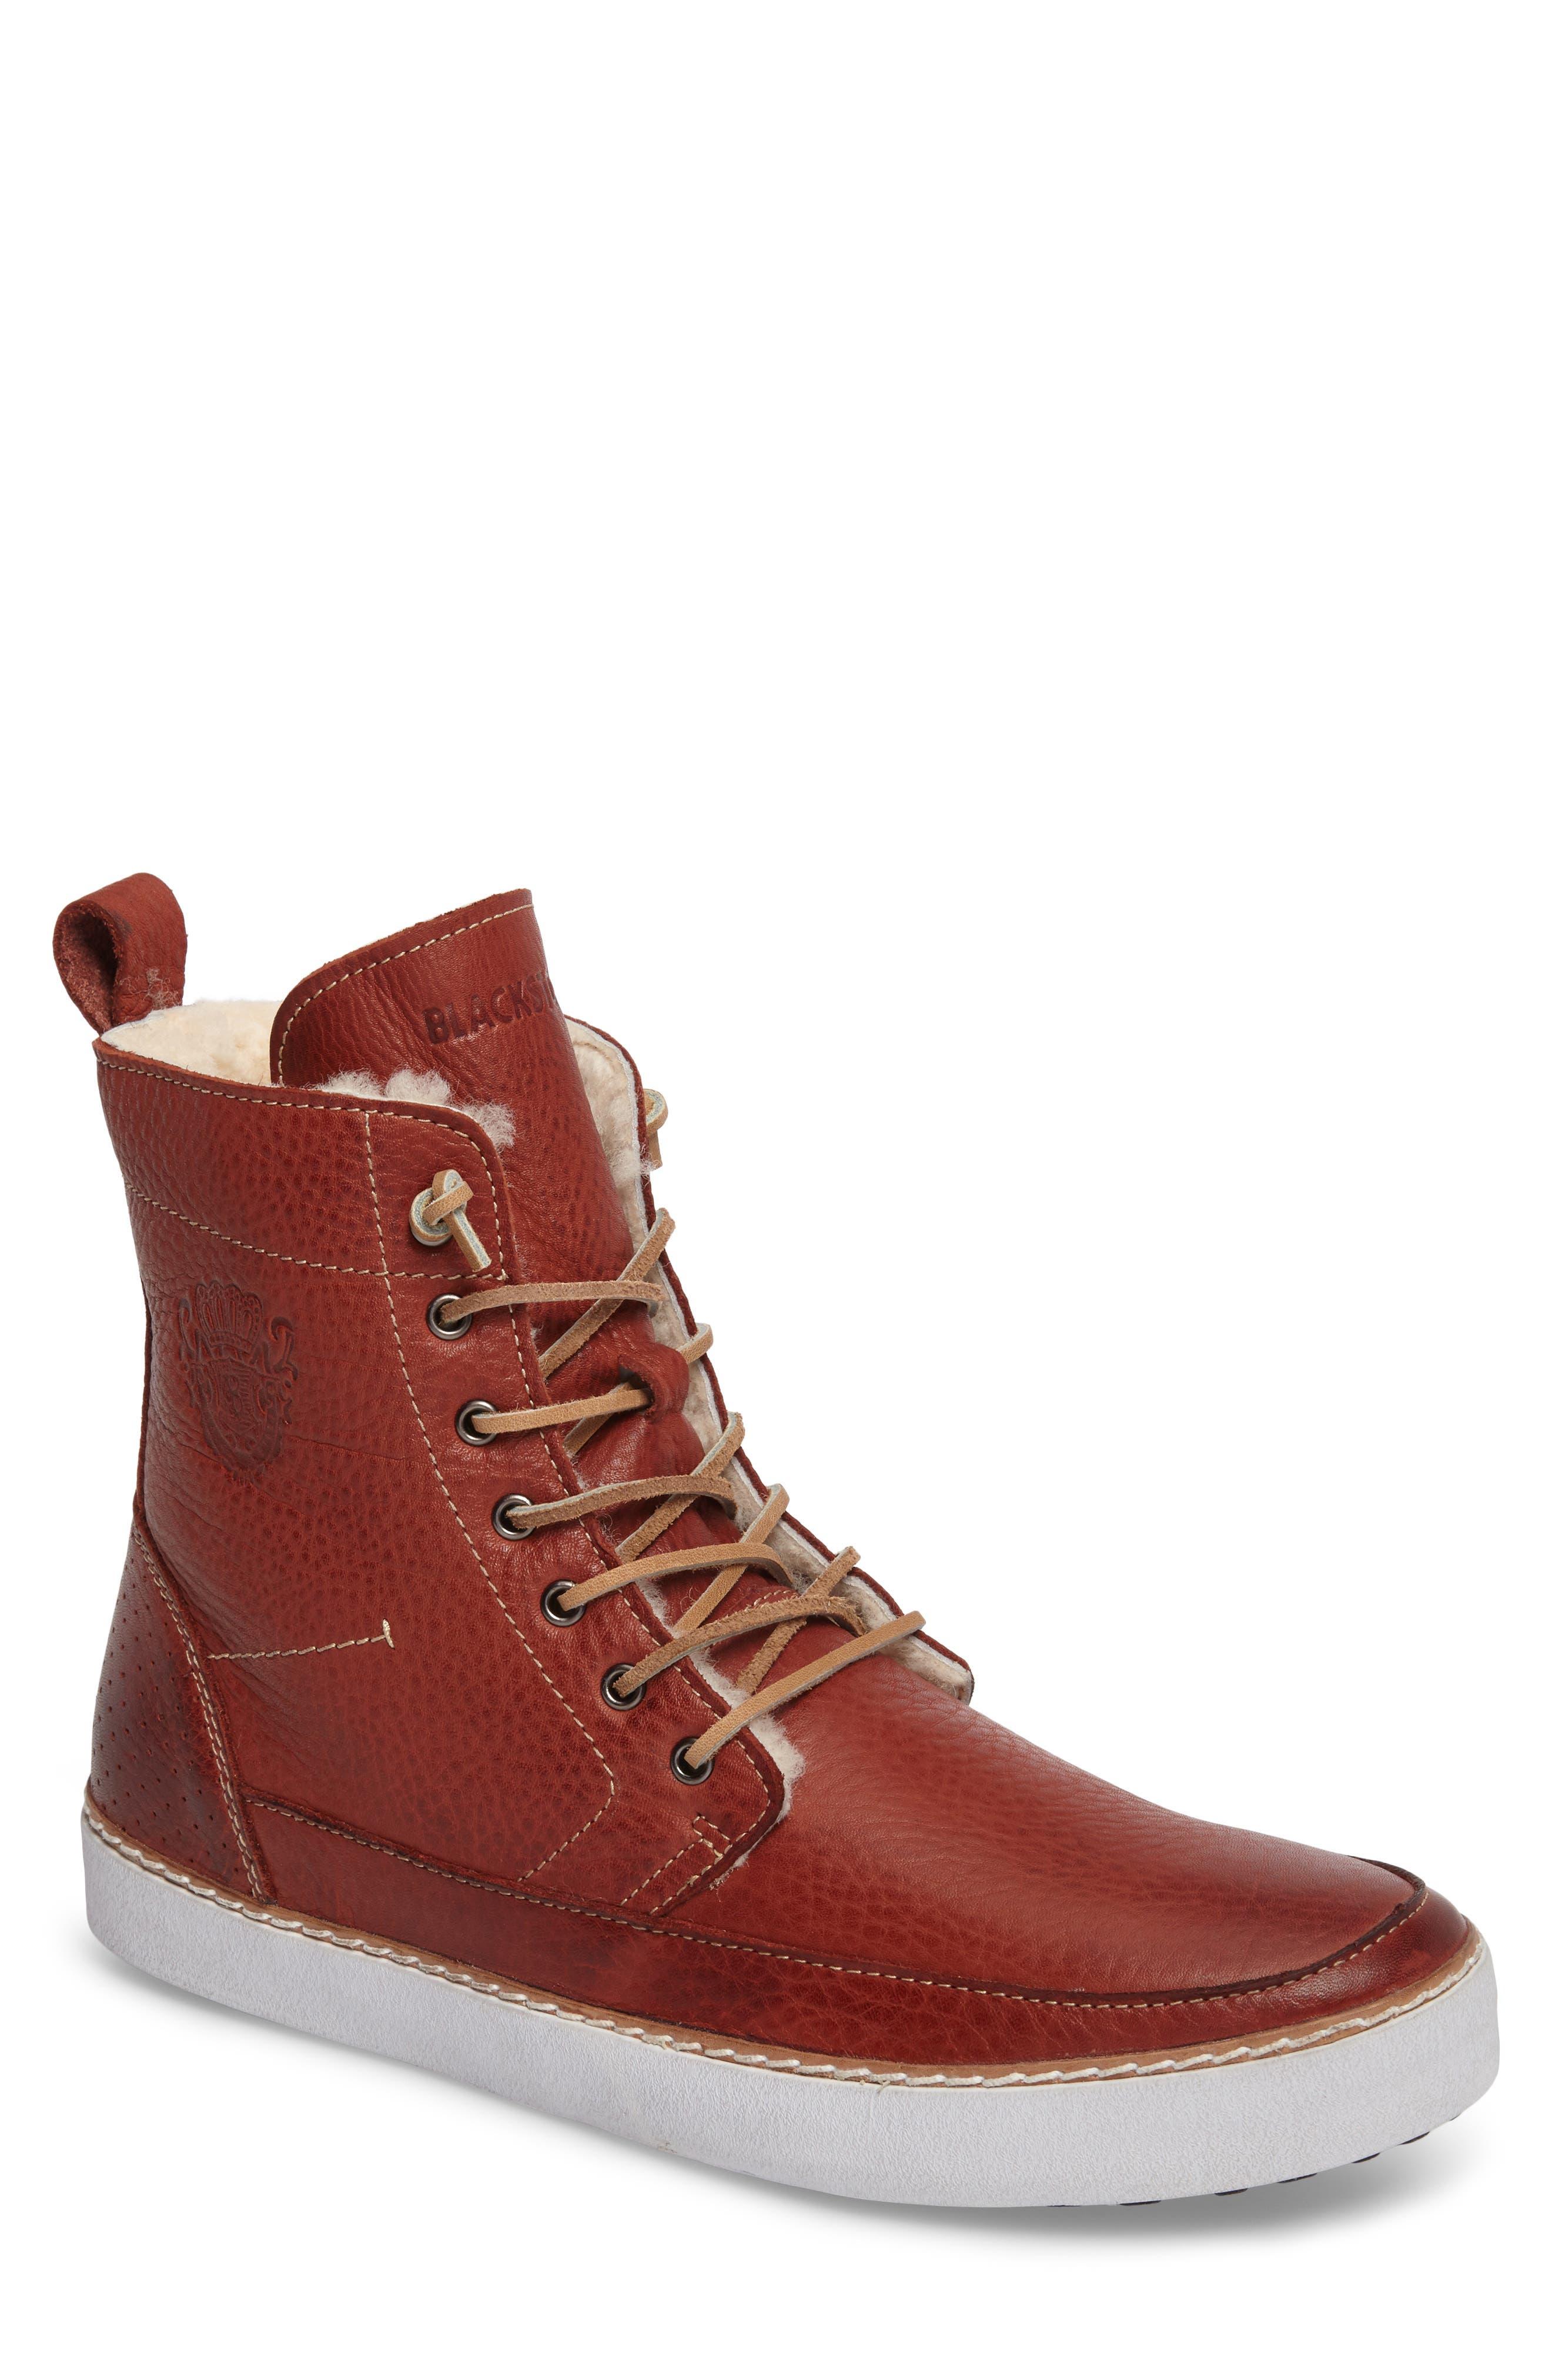 'AM 32' Shearling Lined Boot,                             Main thumbnail 1, color,                             200